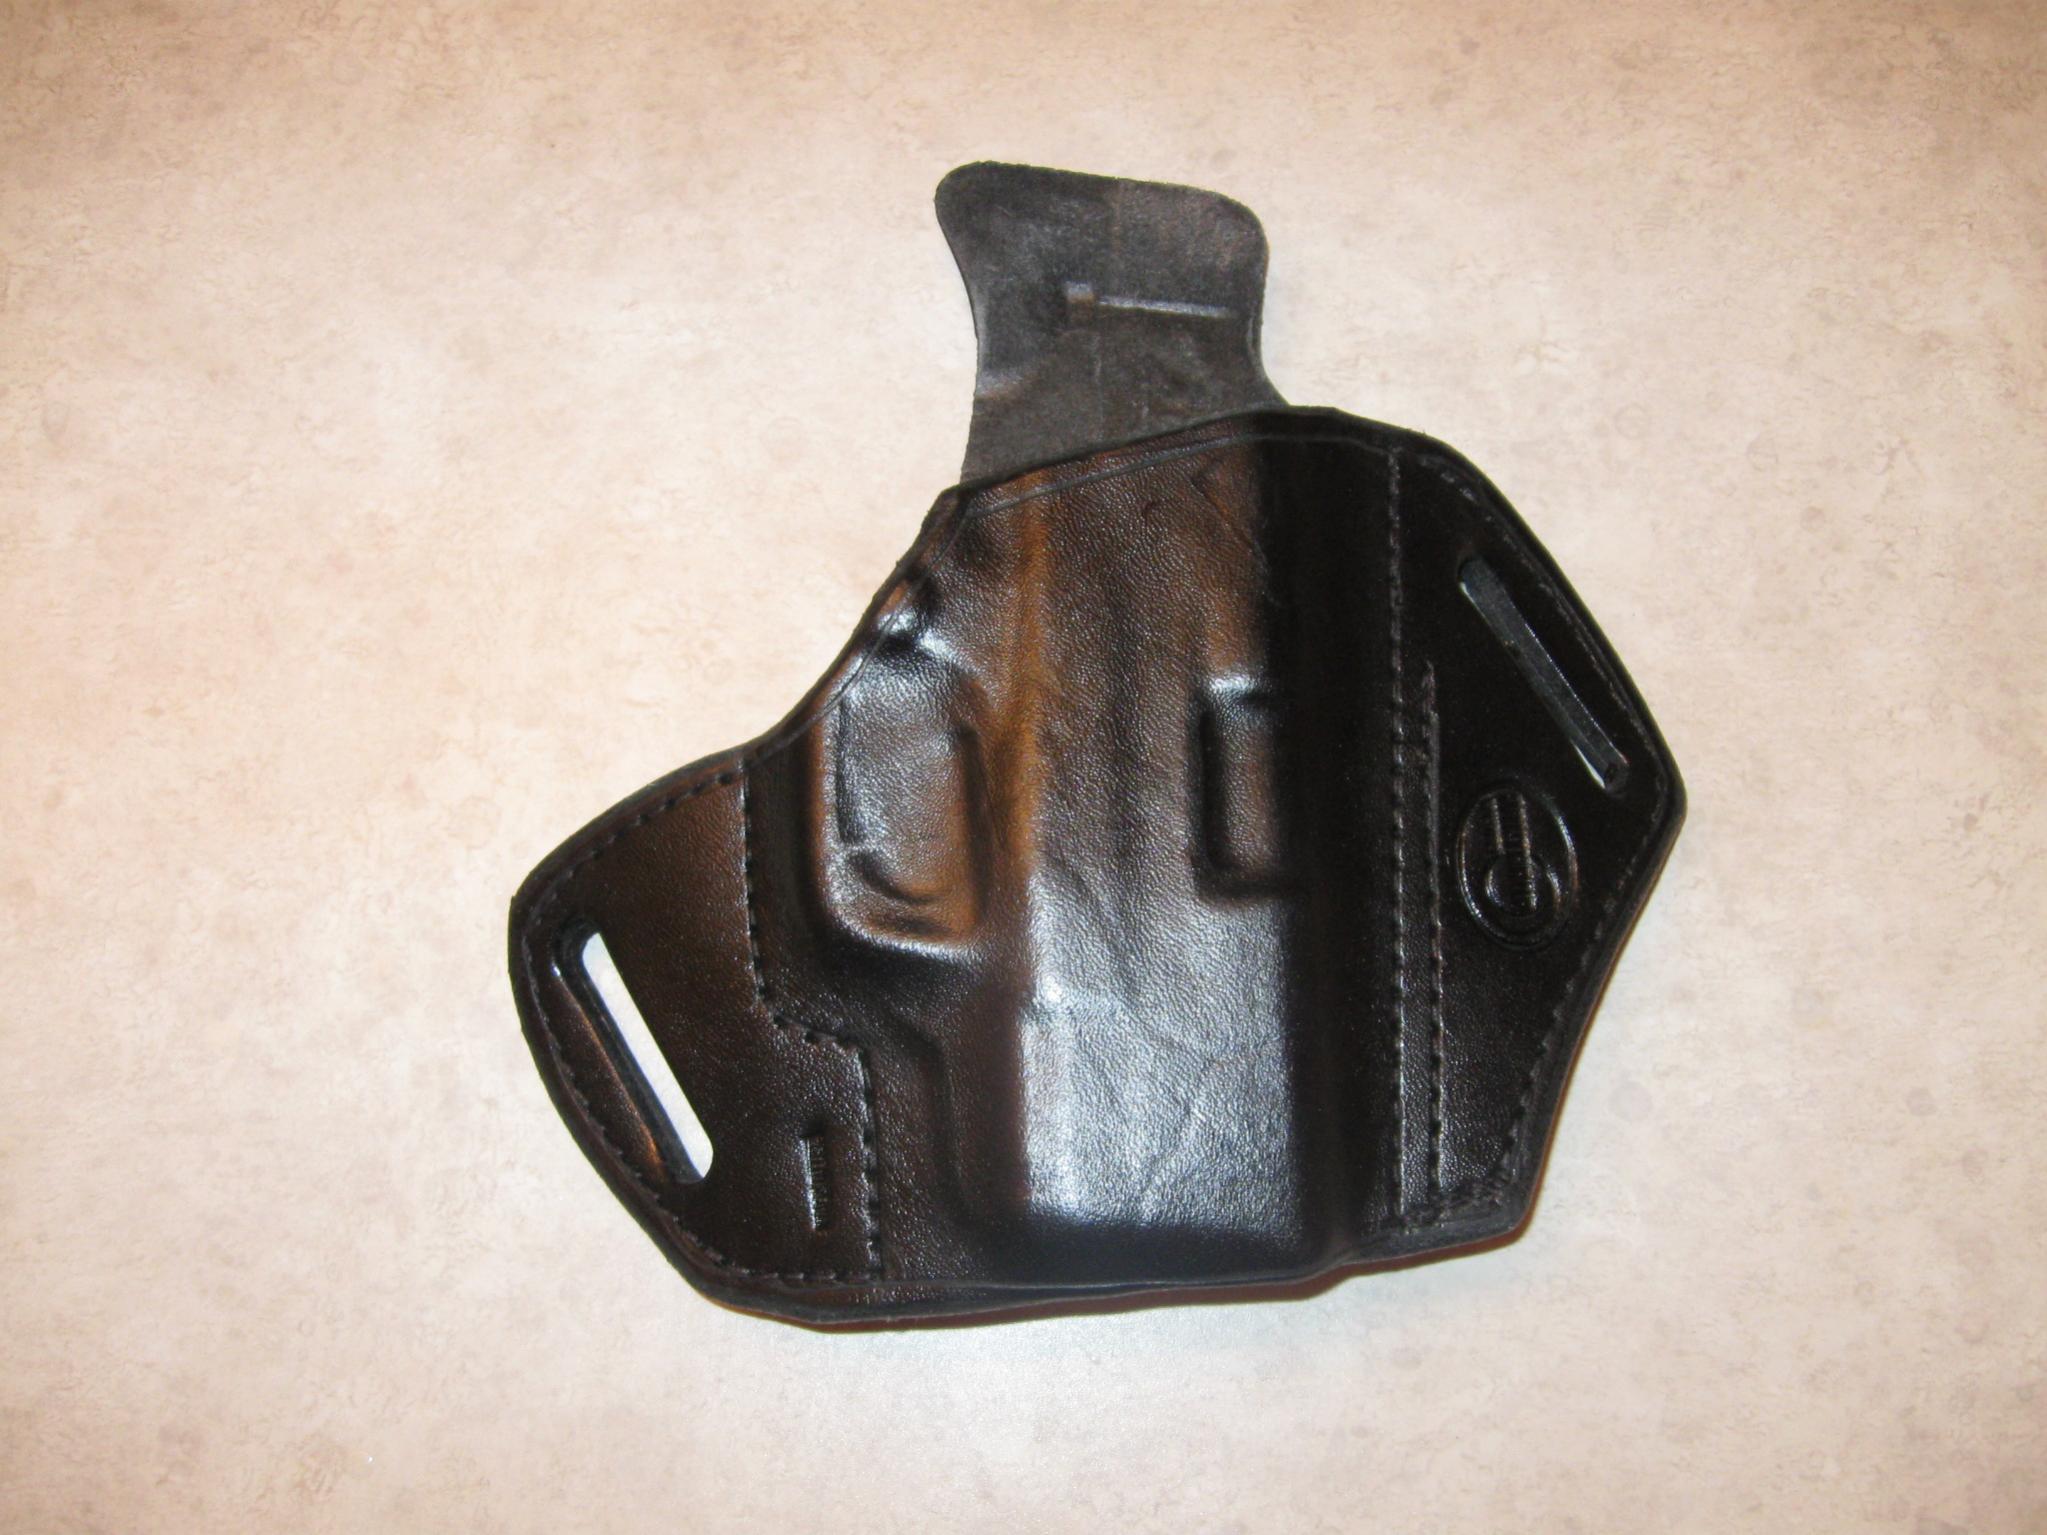 OWB Concealed Carry-owb-holsters-carry-003.jpg